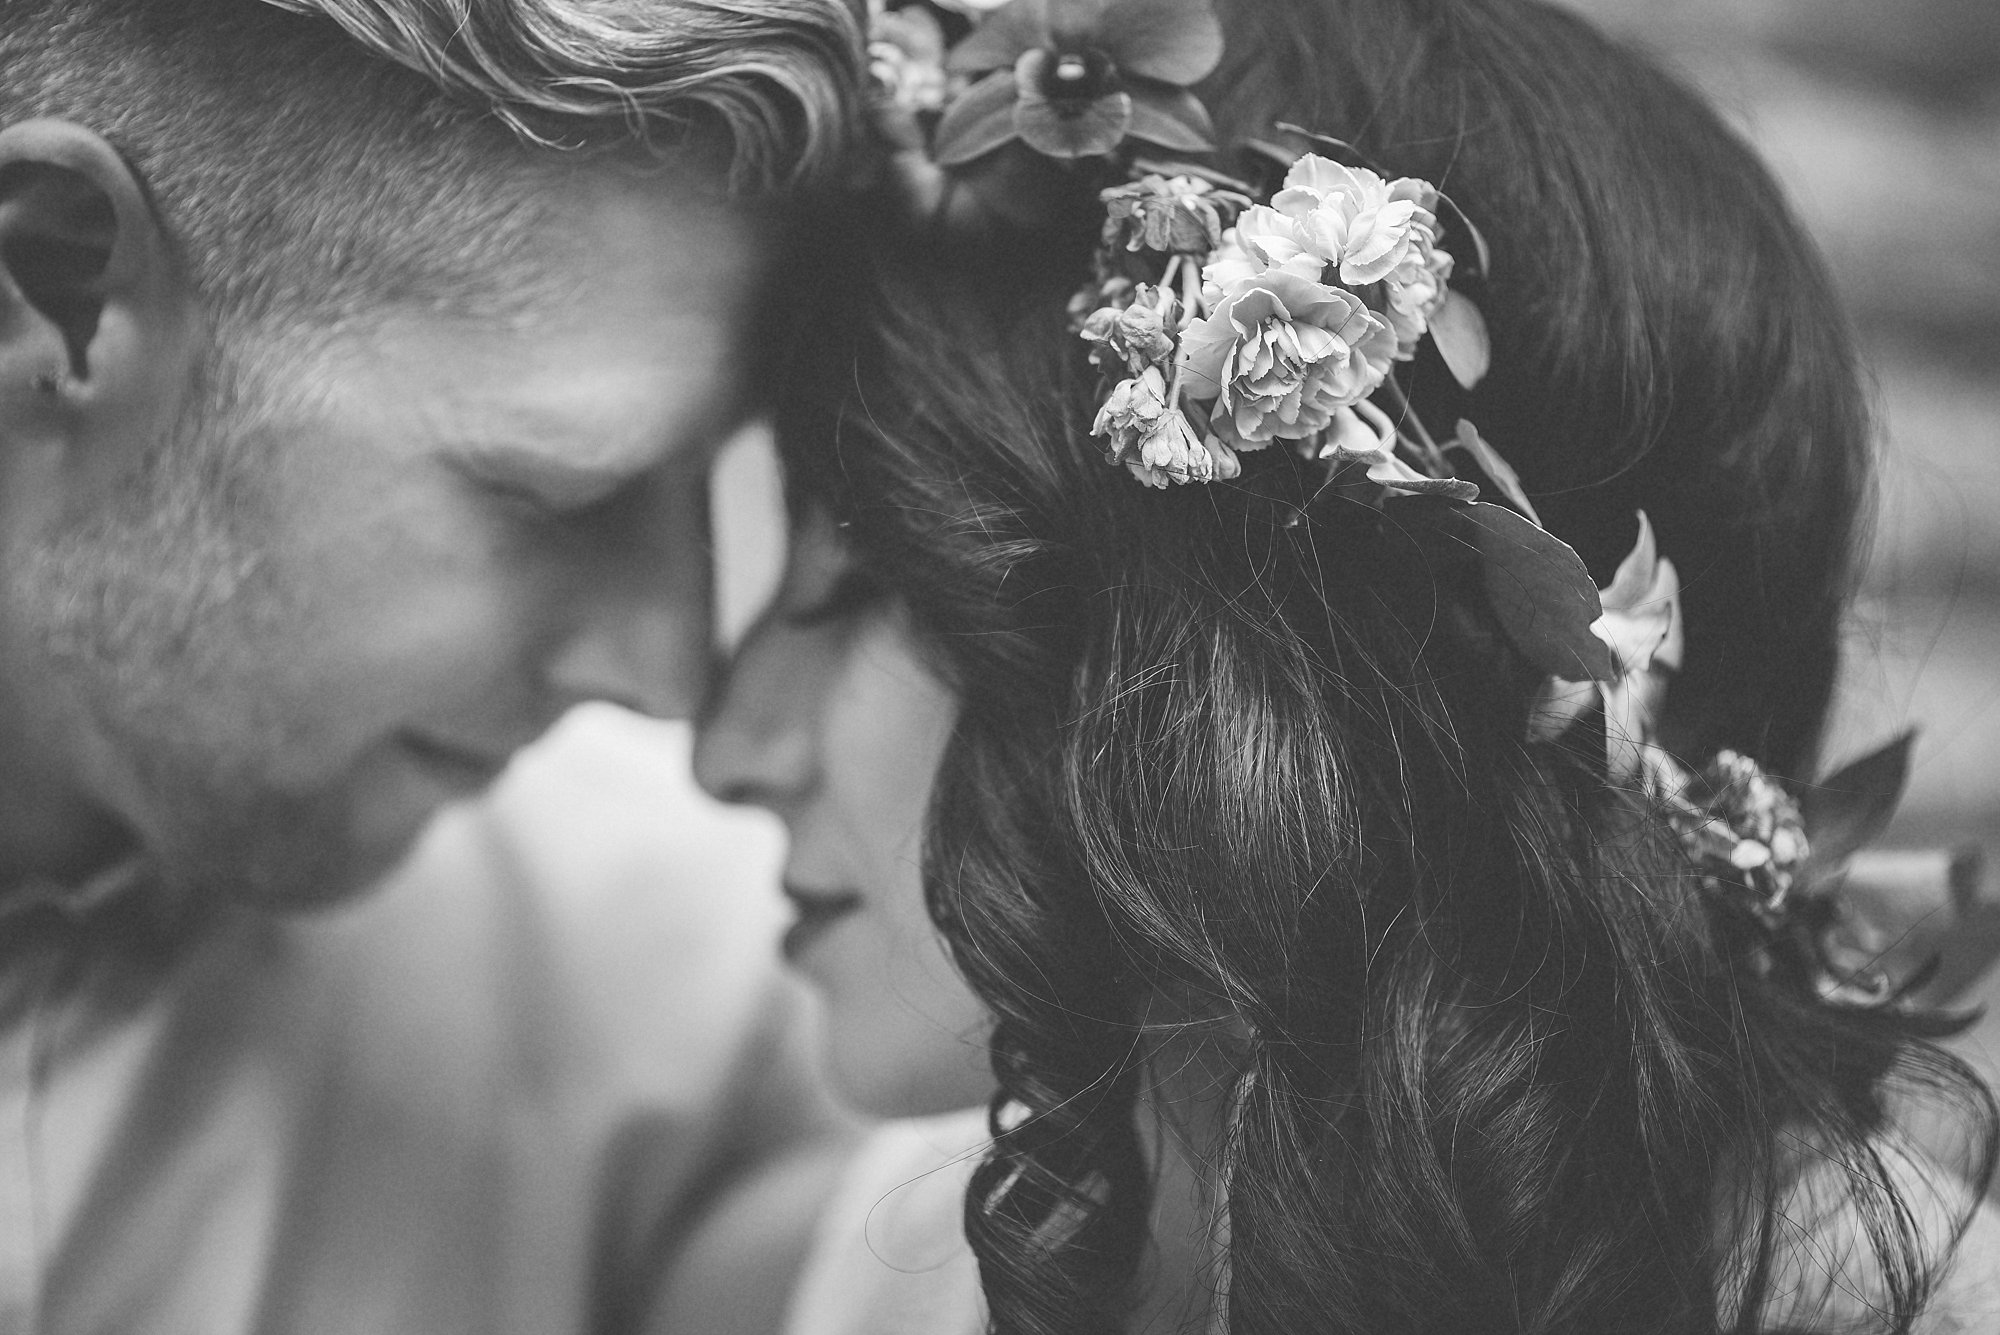 alex-yazmin-wedding-photographer-antigua-guatemala-009